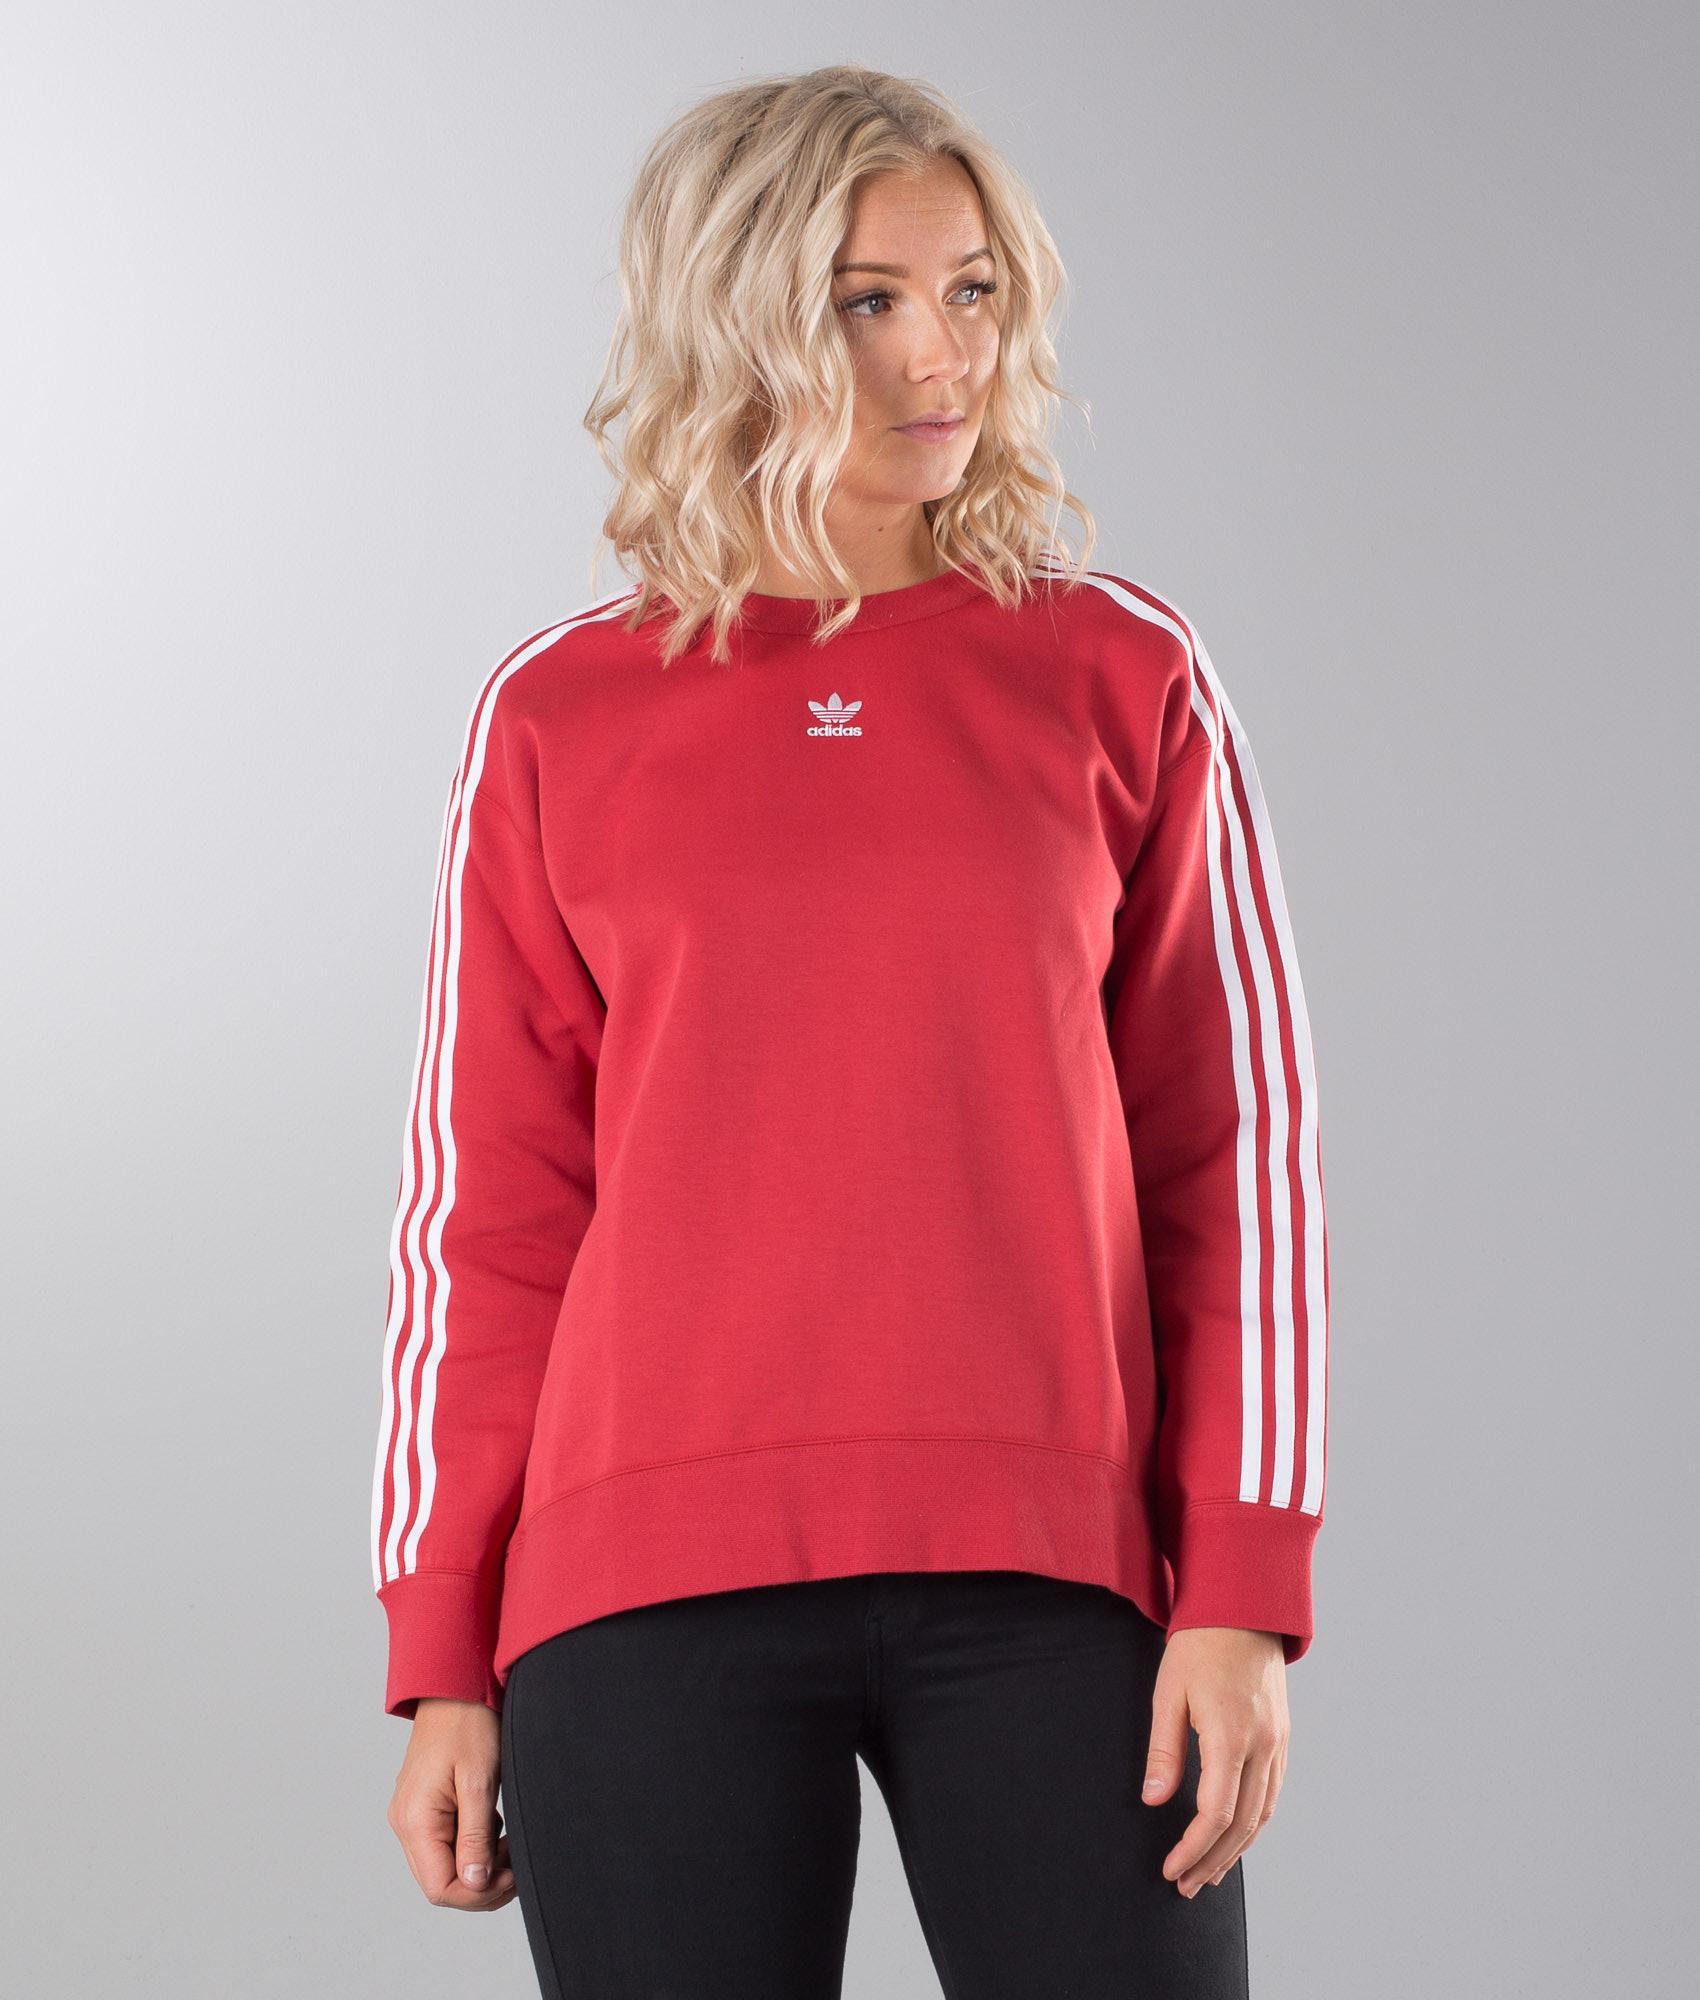 02cc97fe Adidas Originals Crew Sweater Raw Red - Ridestore.com